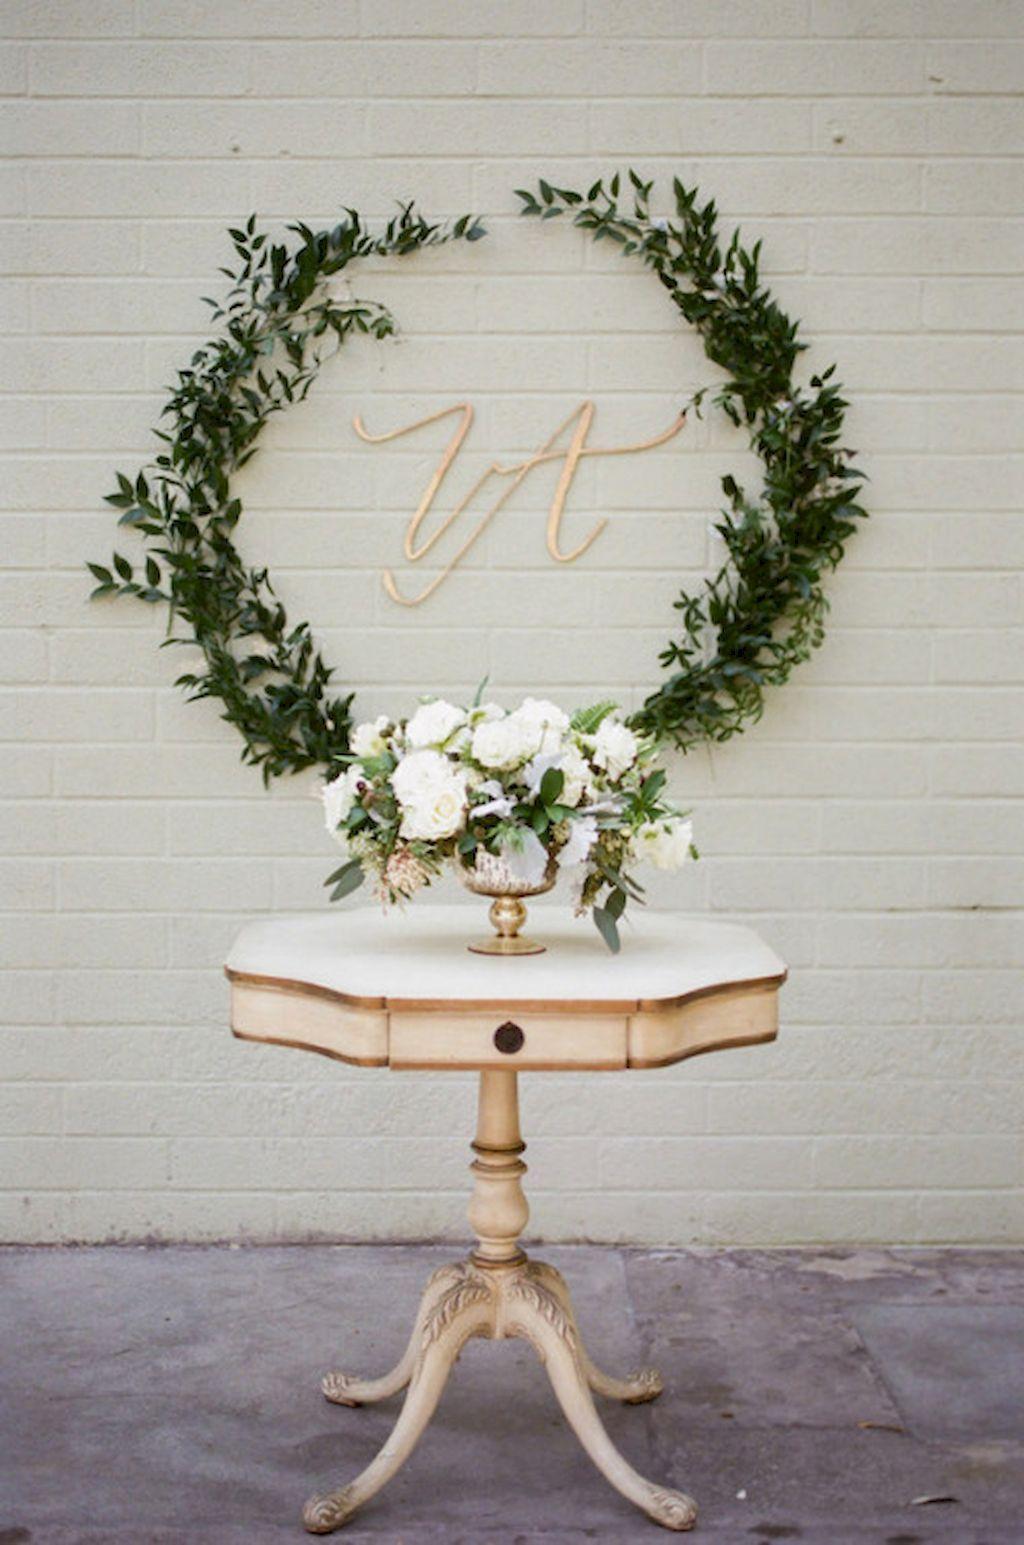 Wedding decor ideas simple   Simple Greenery Wedding Centerpieces Decor Ideas  BuJ Rehearsal